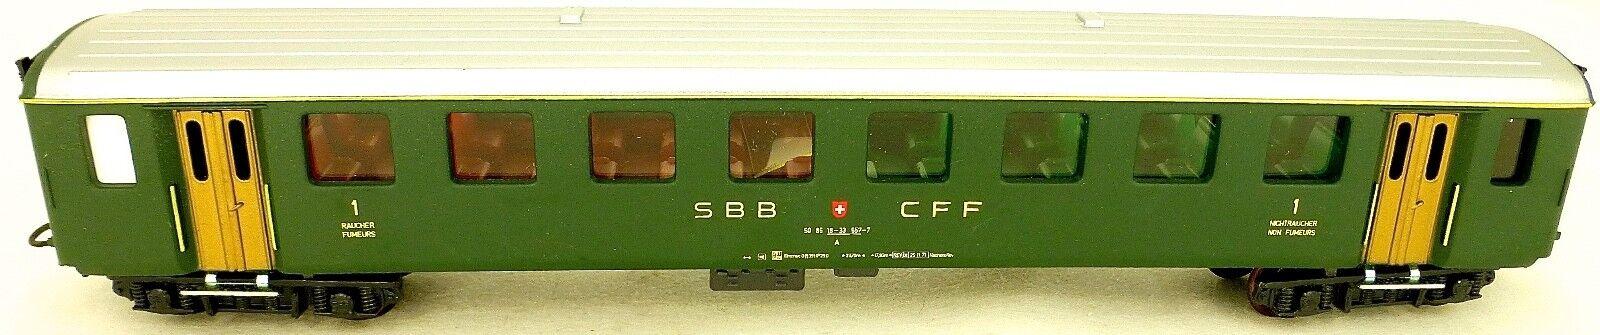 SBB Cff Vagones a 50 85 16-33 557-7 Hag 415 H0 1 87 Å